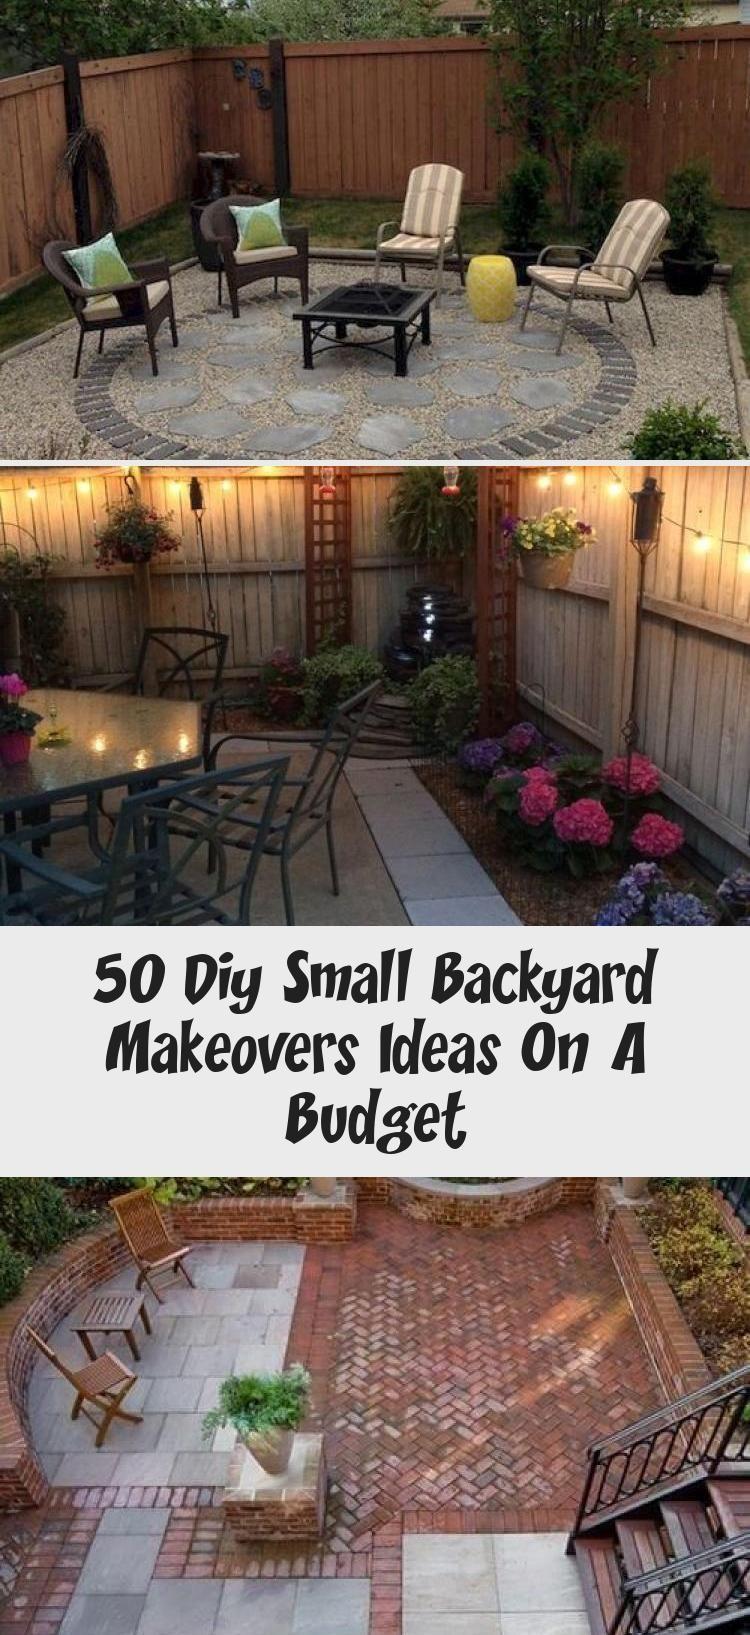 50 DIY Small Backyard Makeovers Ideas on a Budget – Kids Room Ideas #Urbanbackya …,  #Backy… Children's room